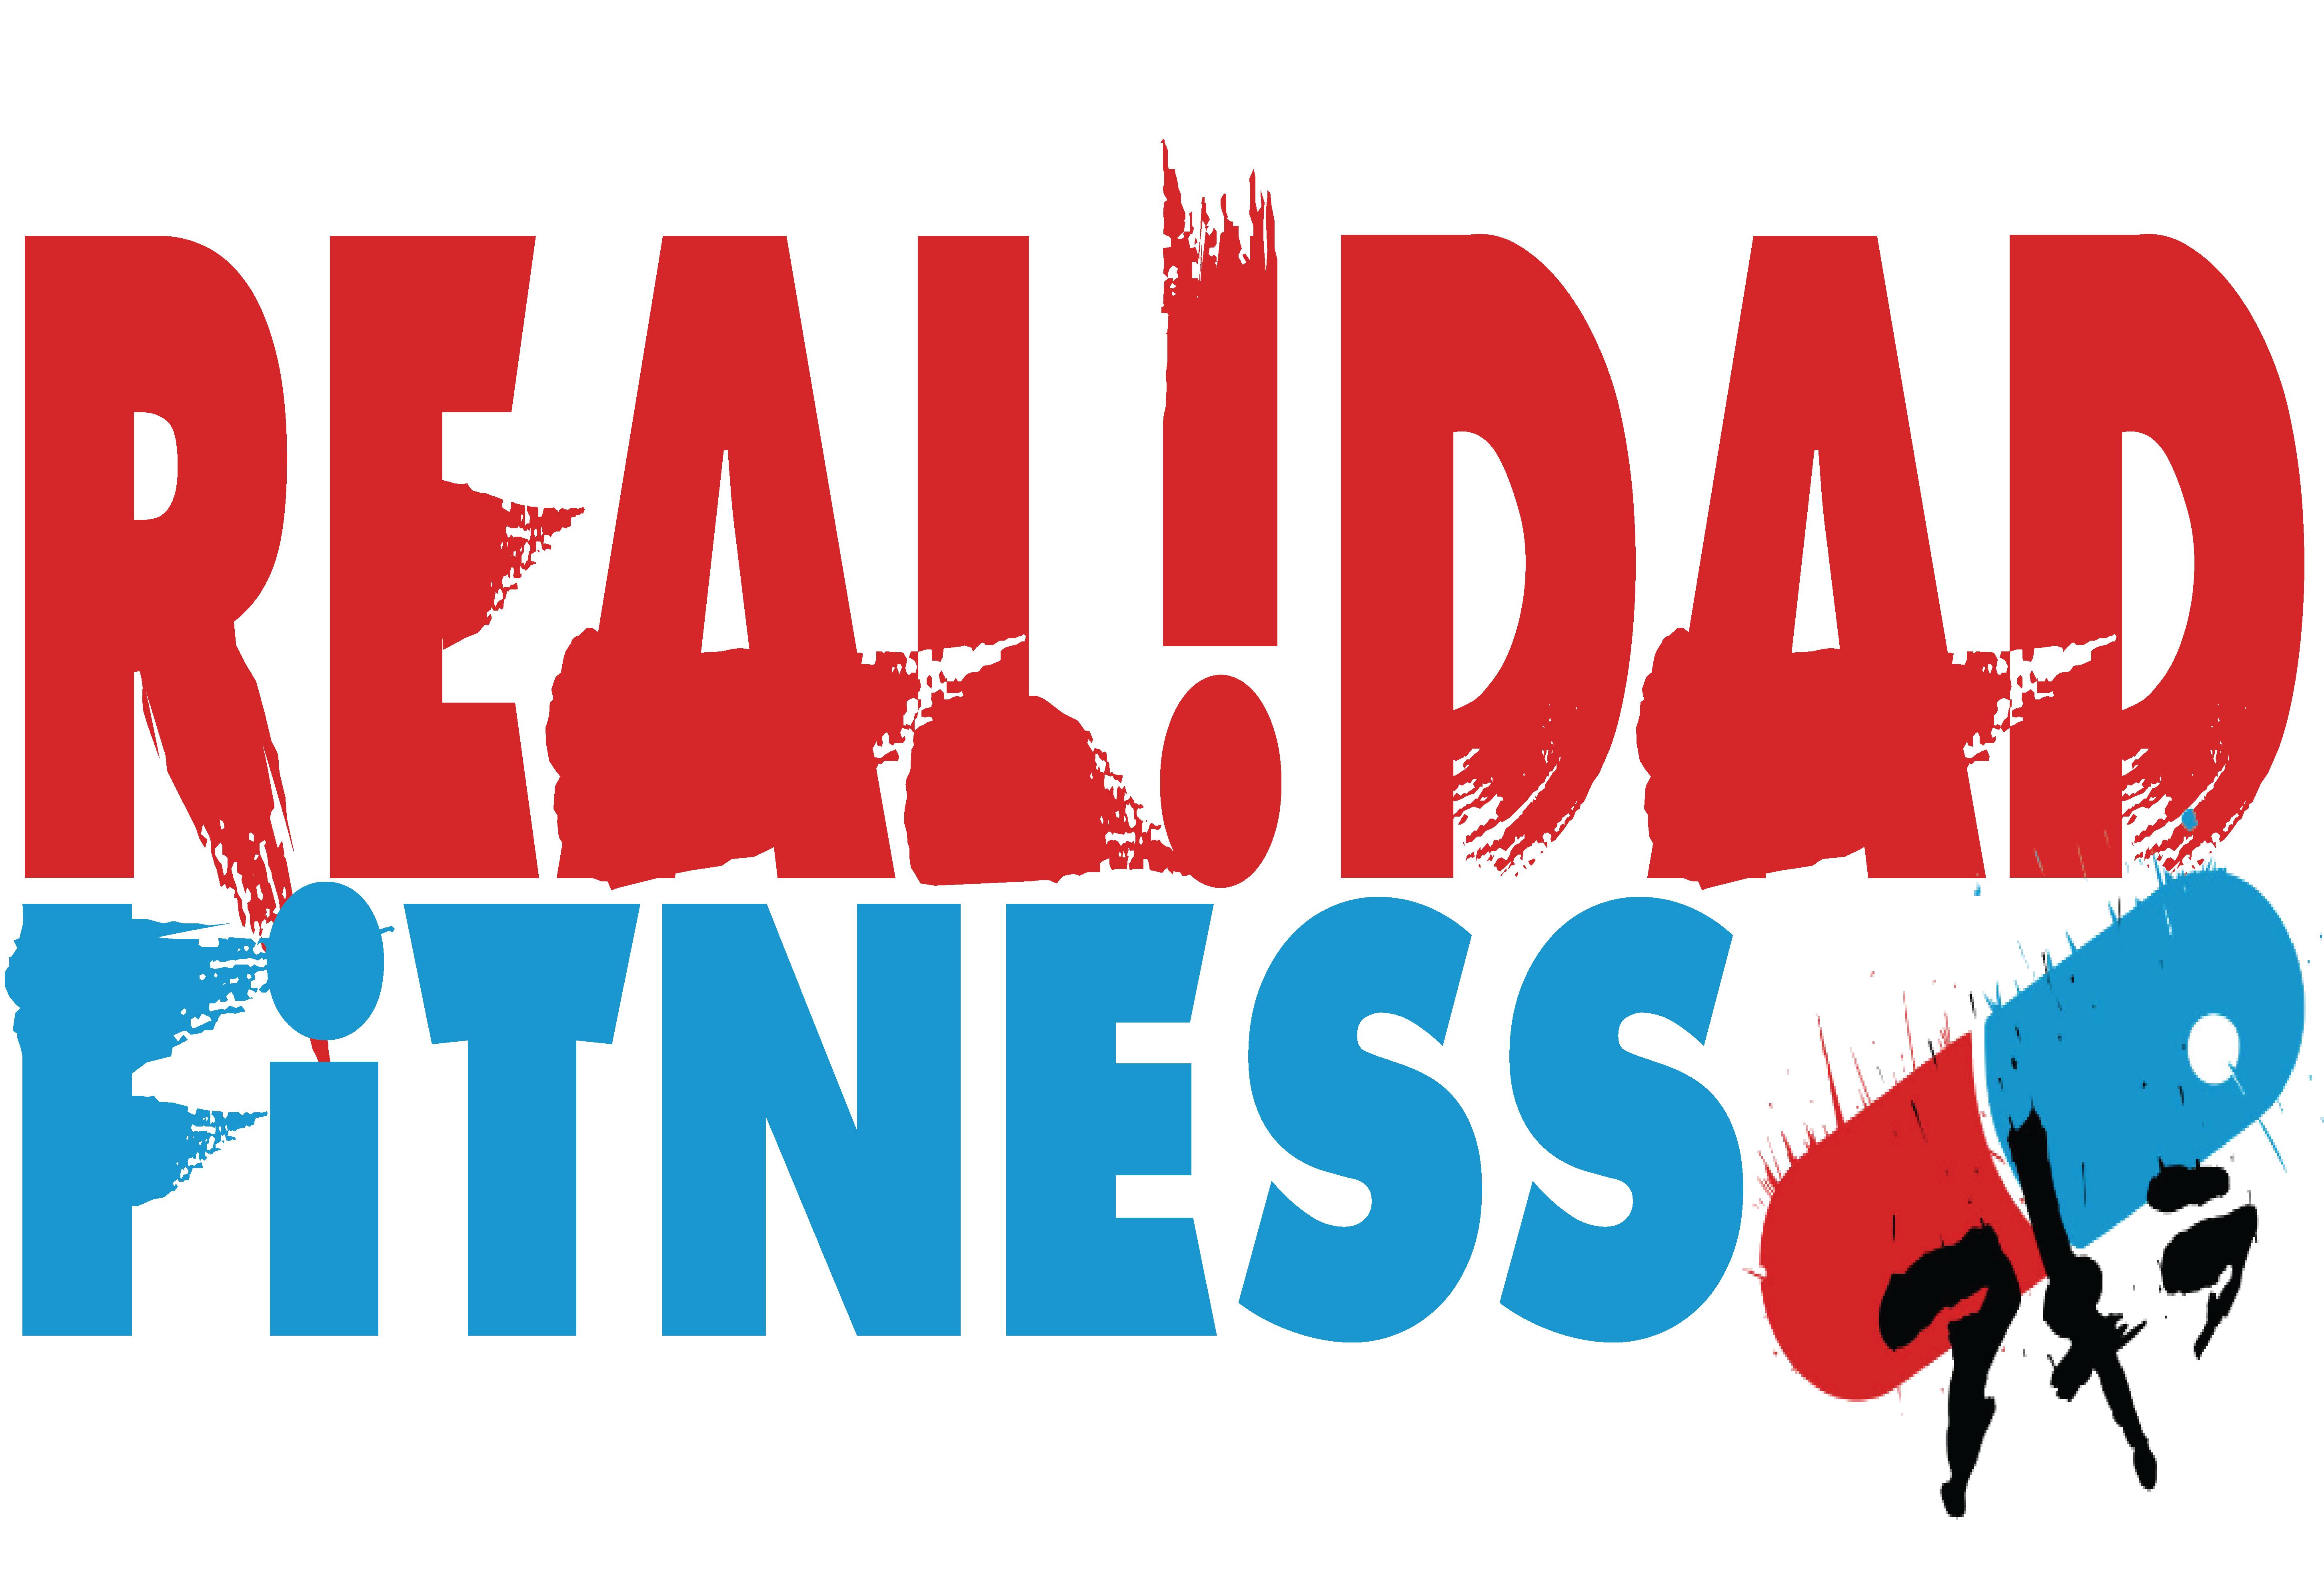 Realidad Fitness